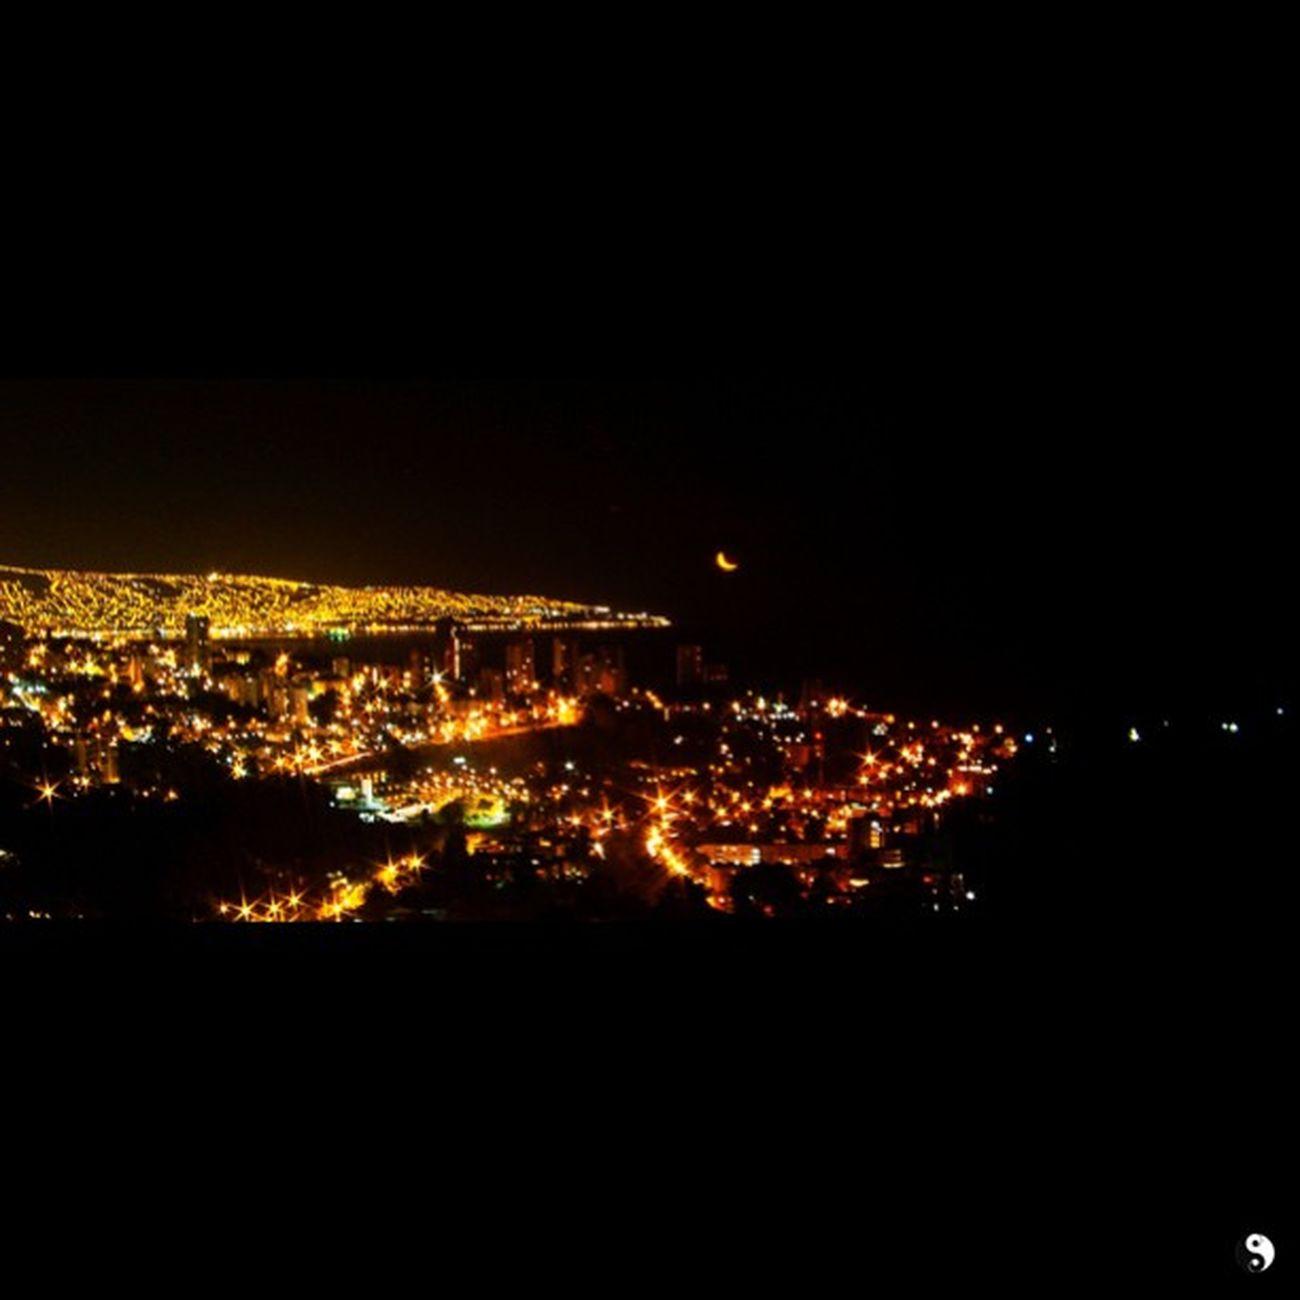 Sequbu Summer Night Valparaíso chile